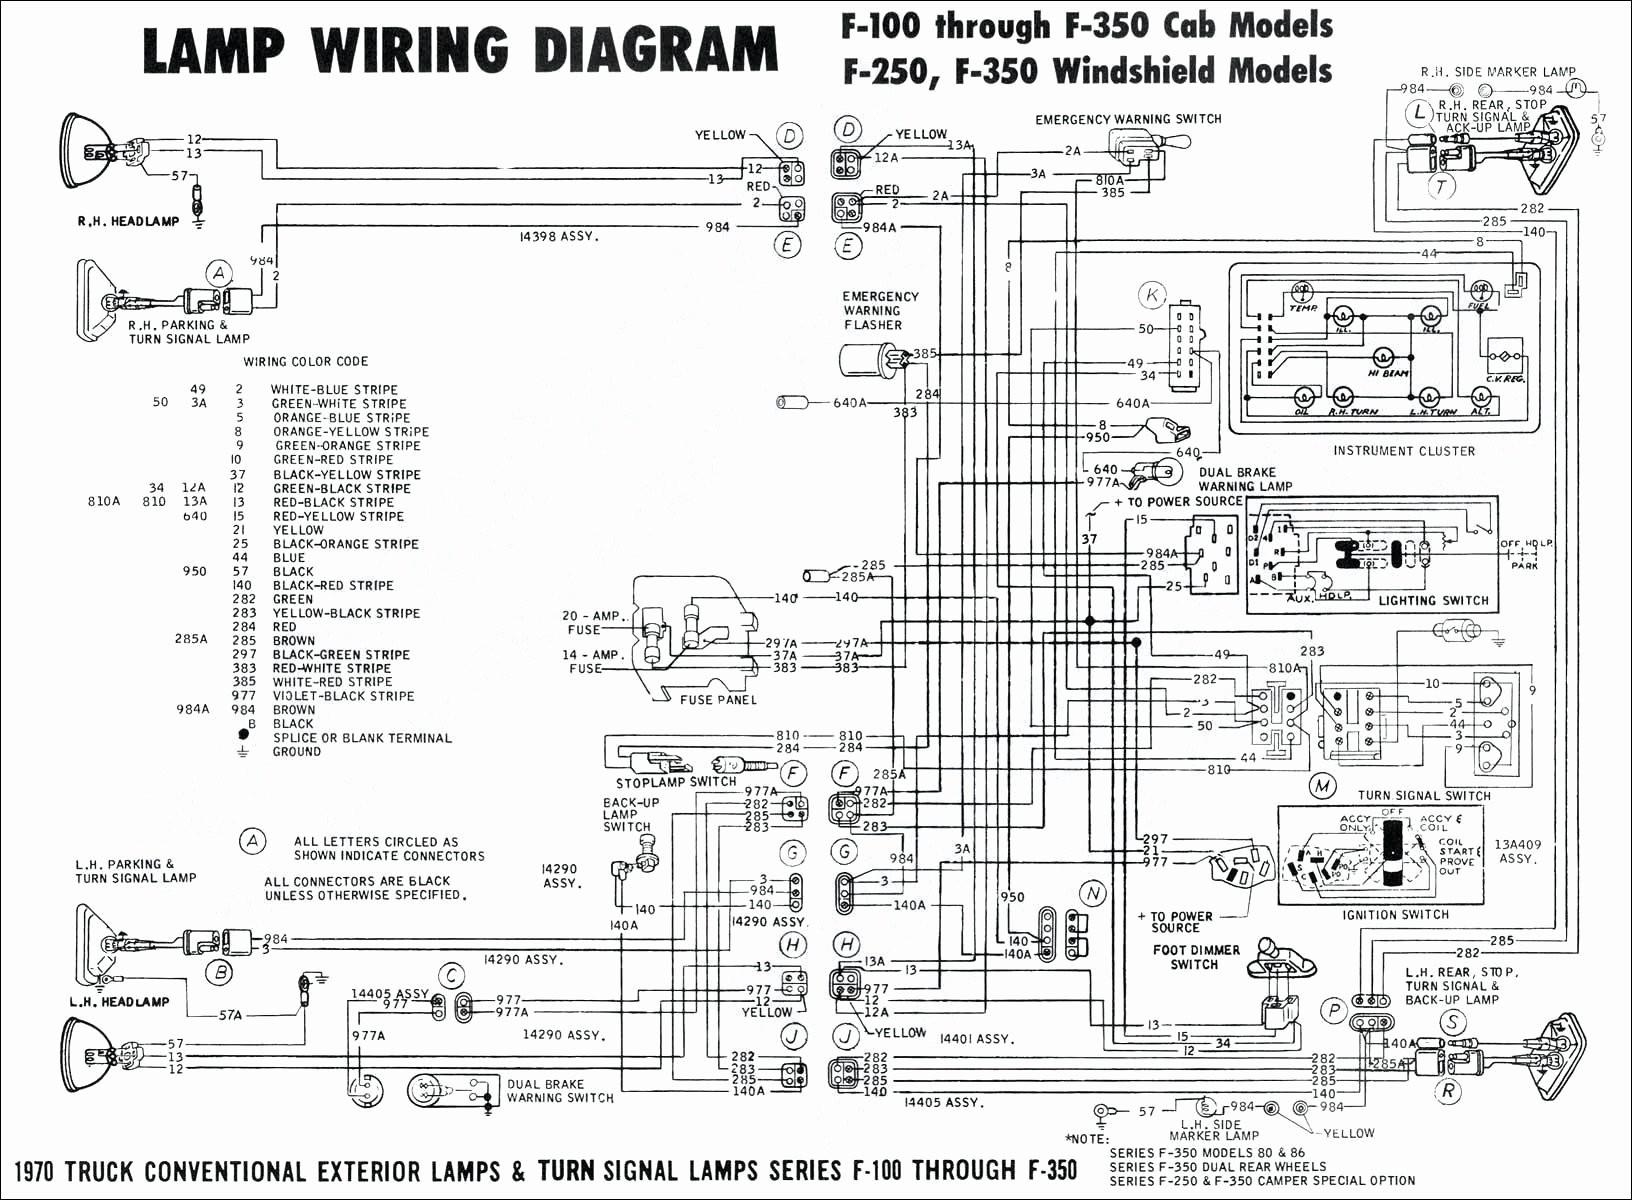 Kenmore Washer Wiring Diagram Earthwise Pressure Washer Wiring Diagrams Worksheet and Wiring Of Kenmore Washer Wiring Diagram